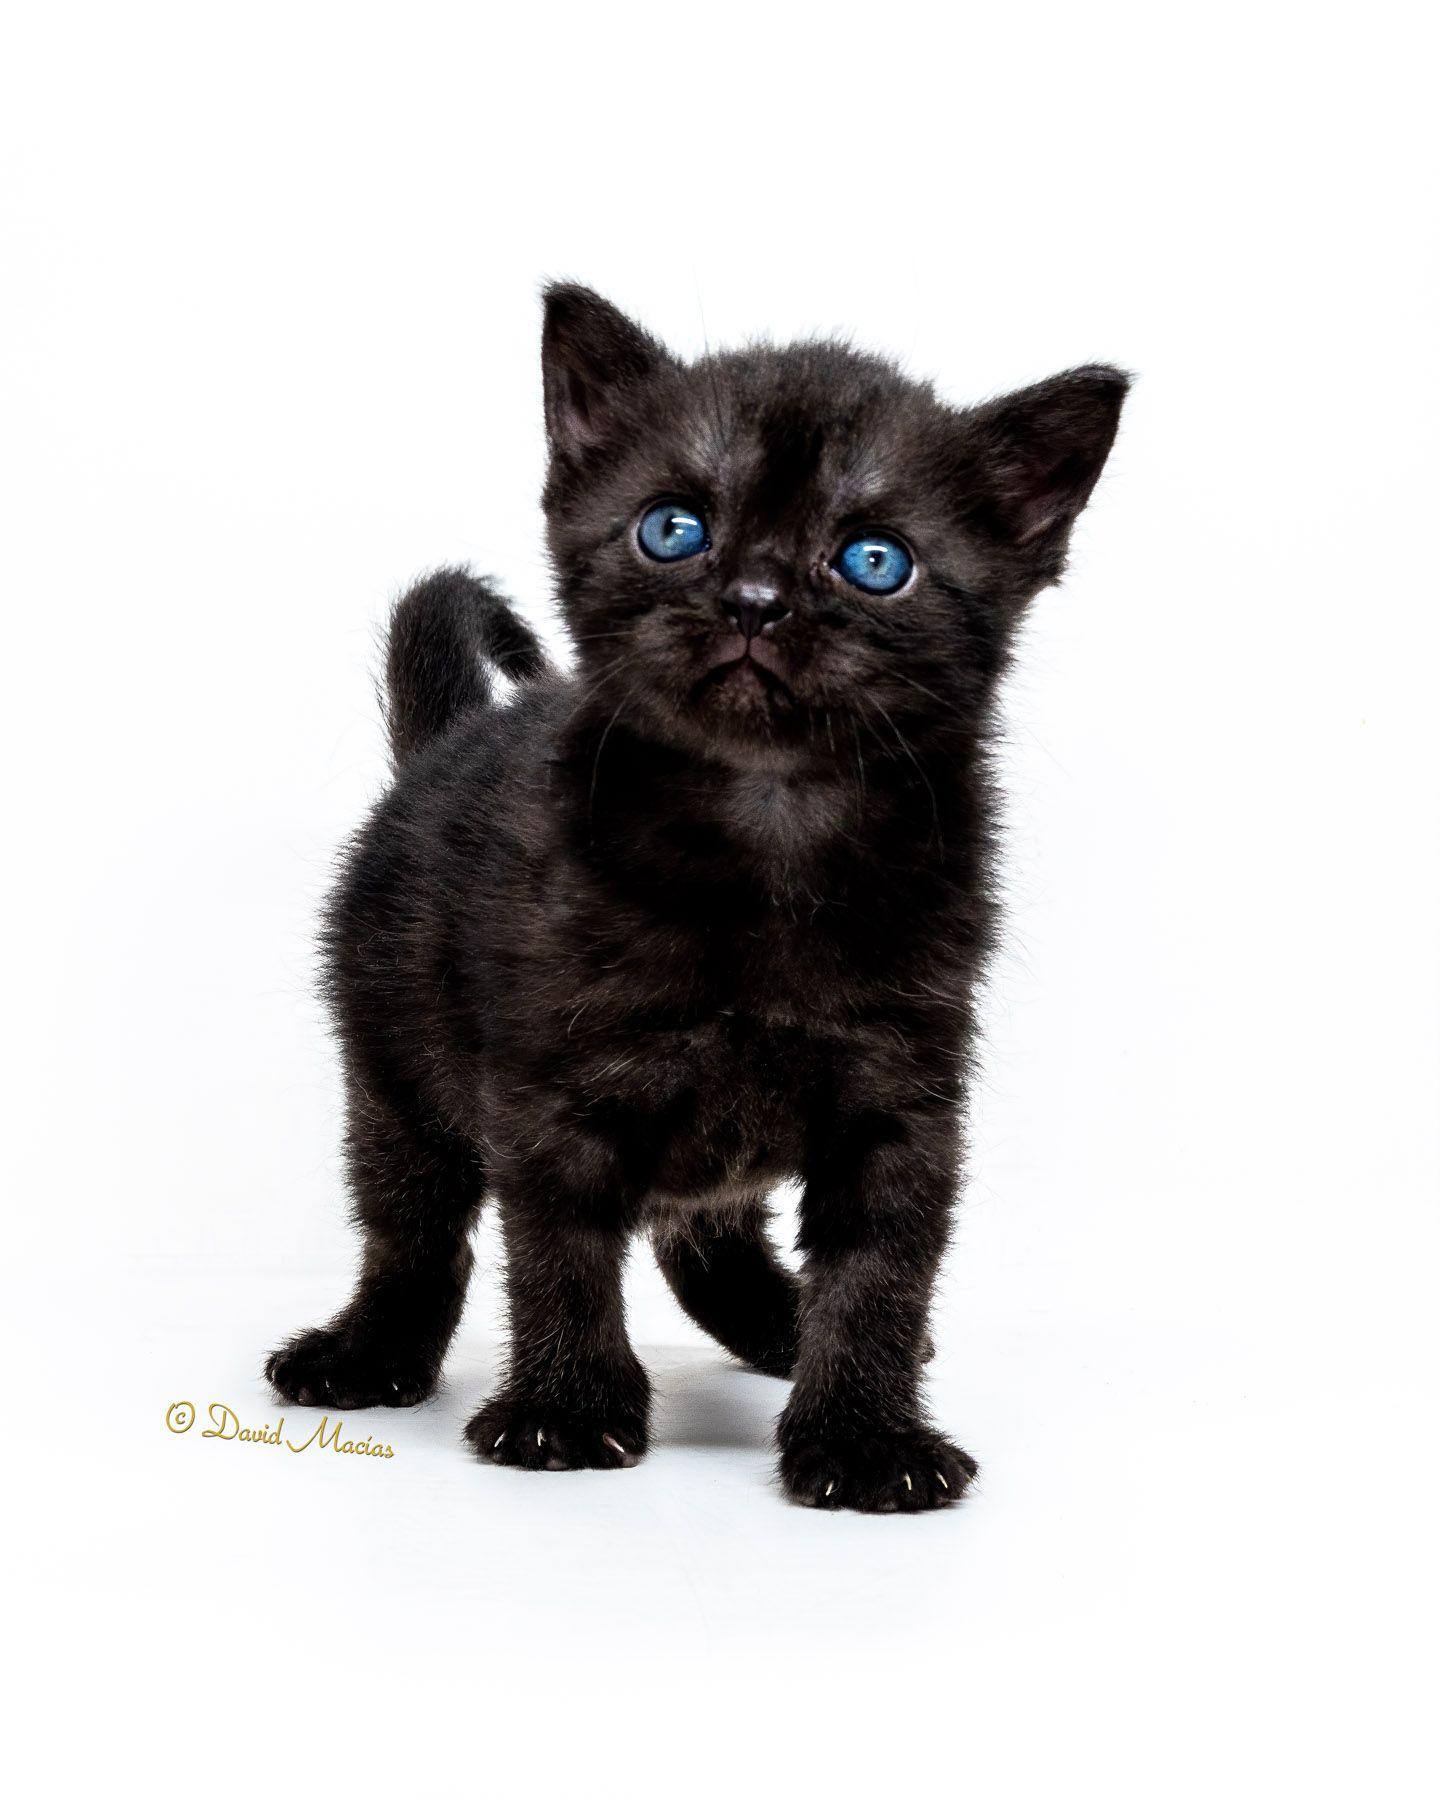 Milla S Kats Luna In 2020 American Shorthair Kitten American Shorthair Silver Tabby Kitten